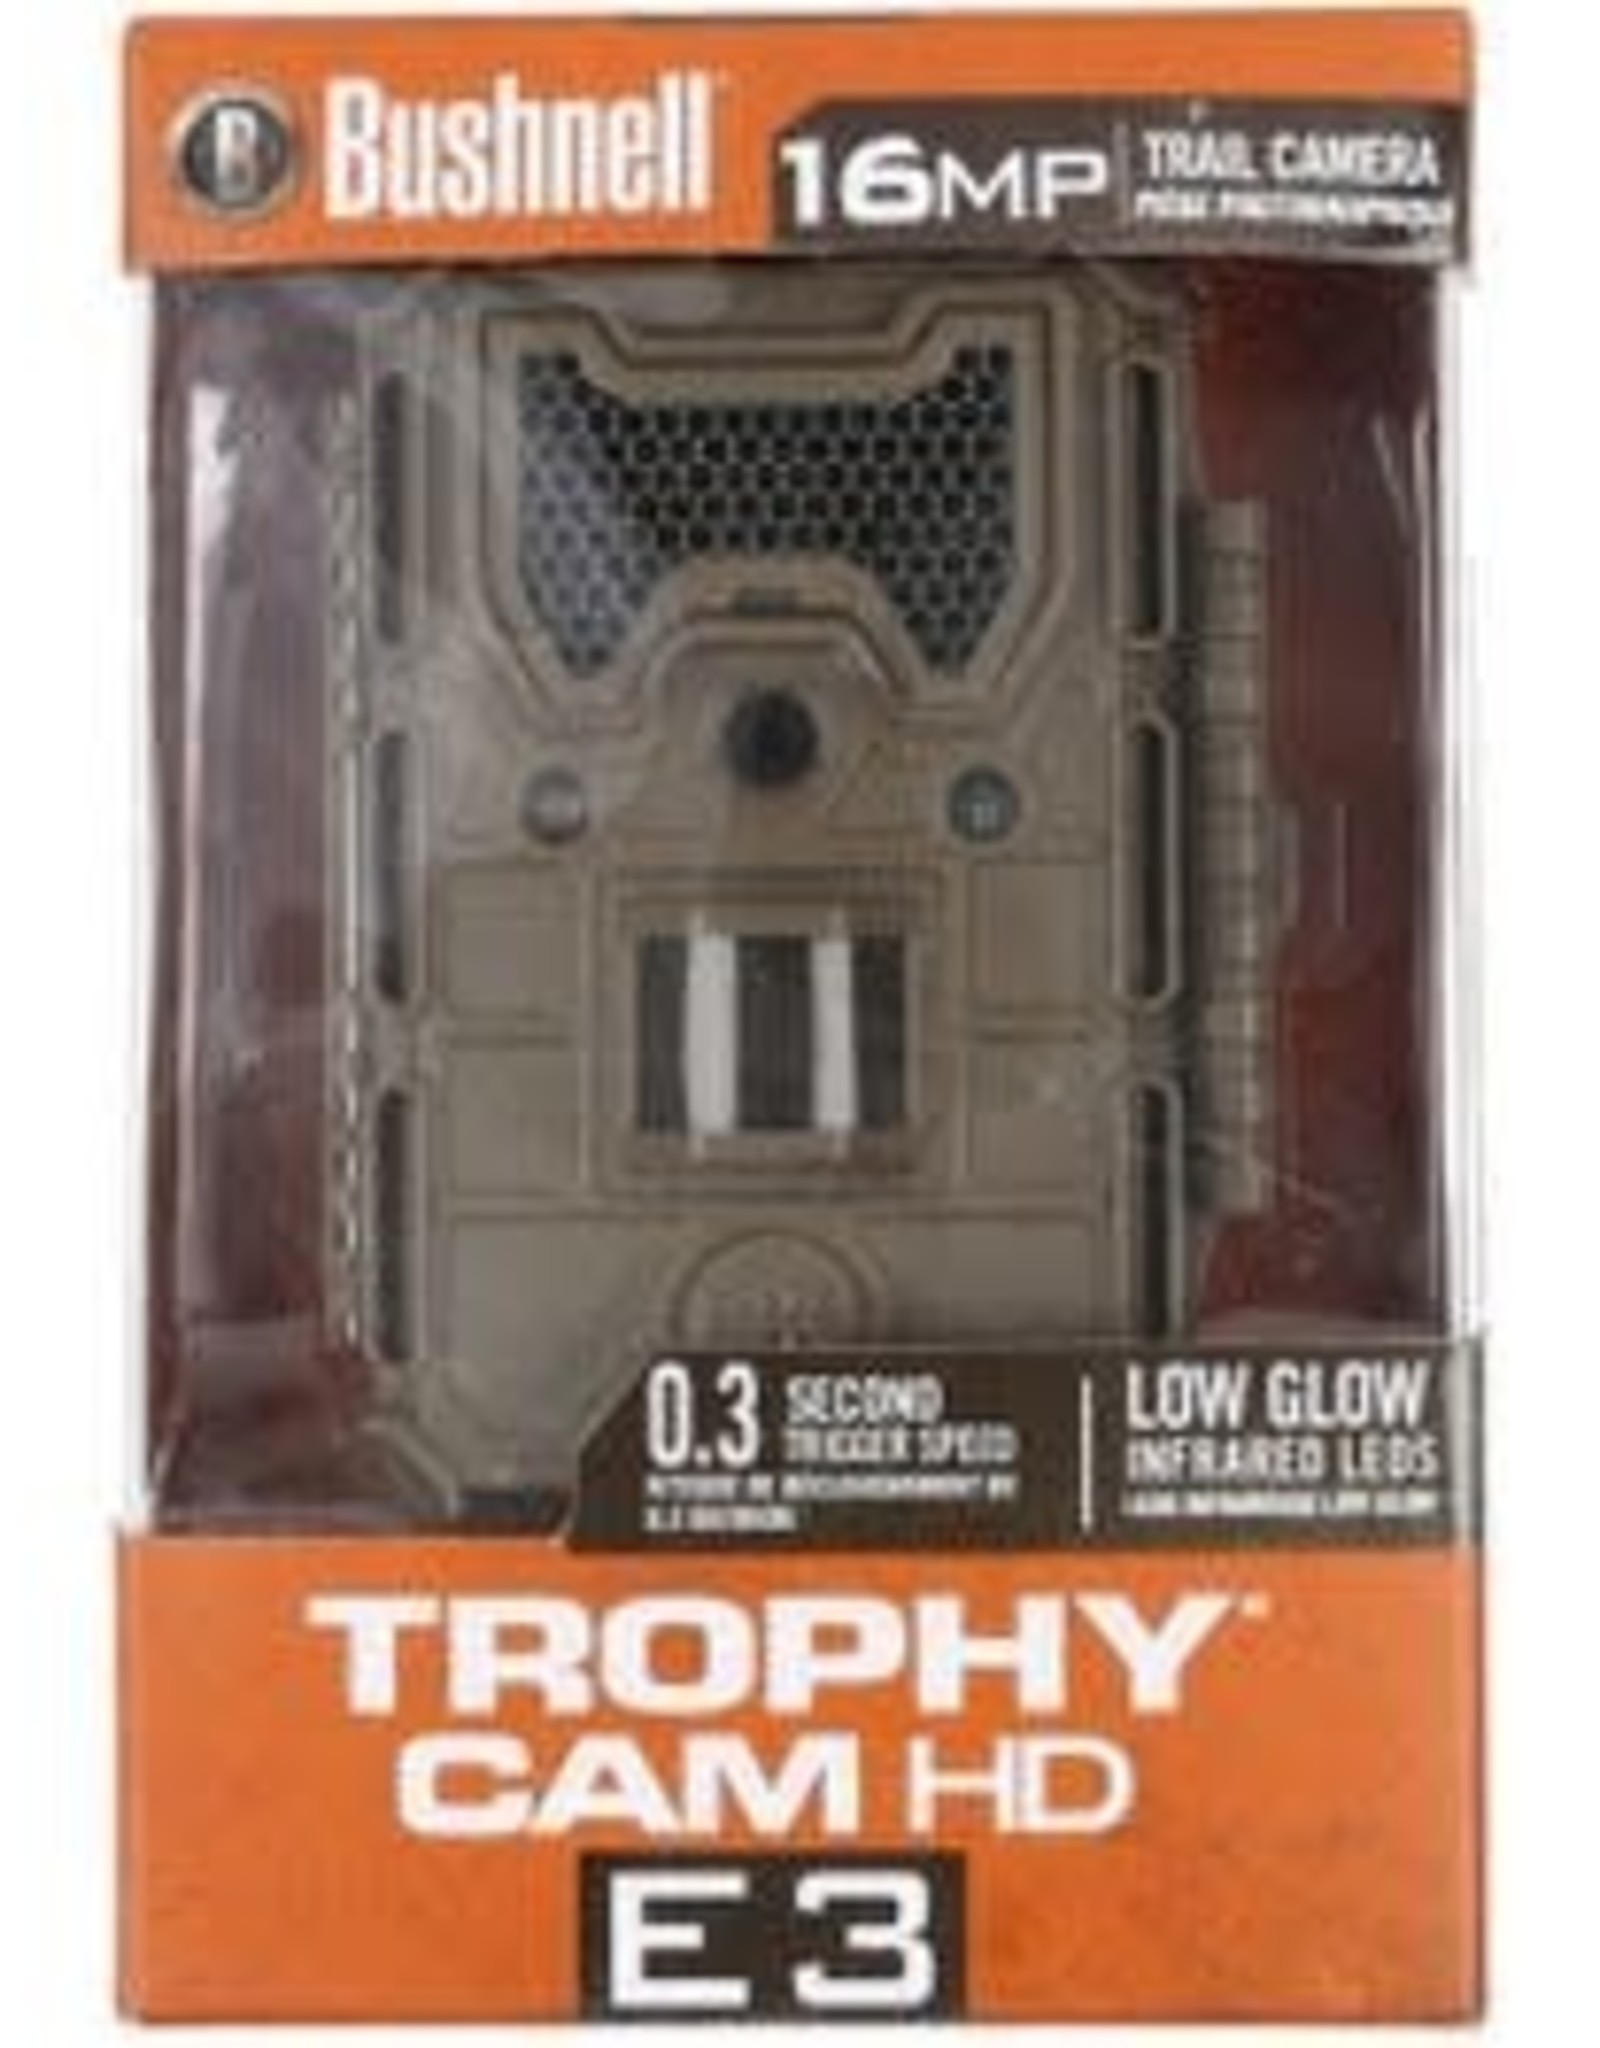 Bushnell 16 MP Trophy Cam Essential E3